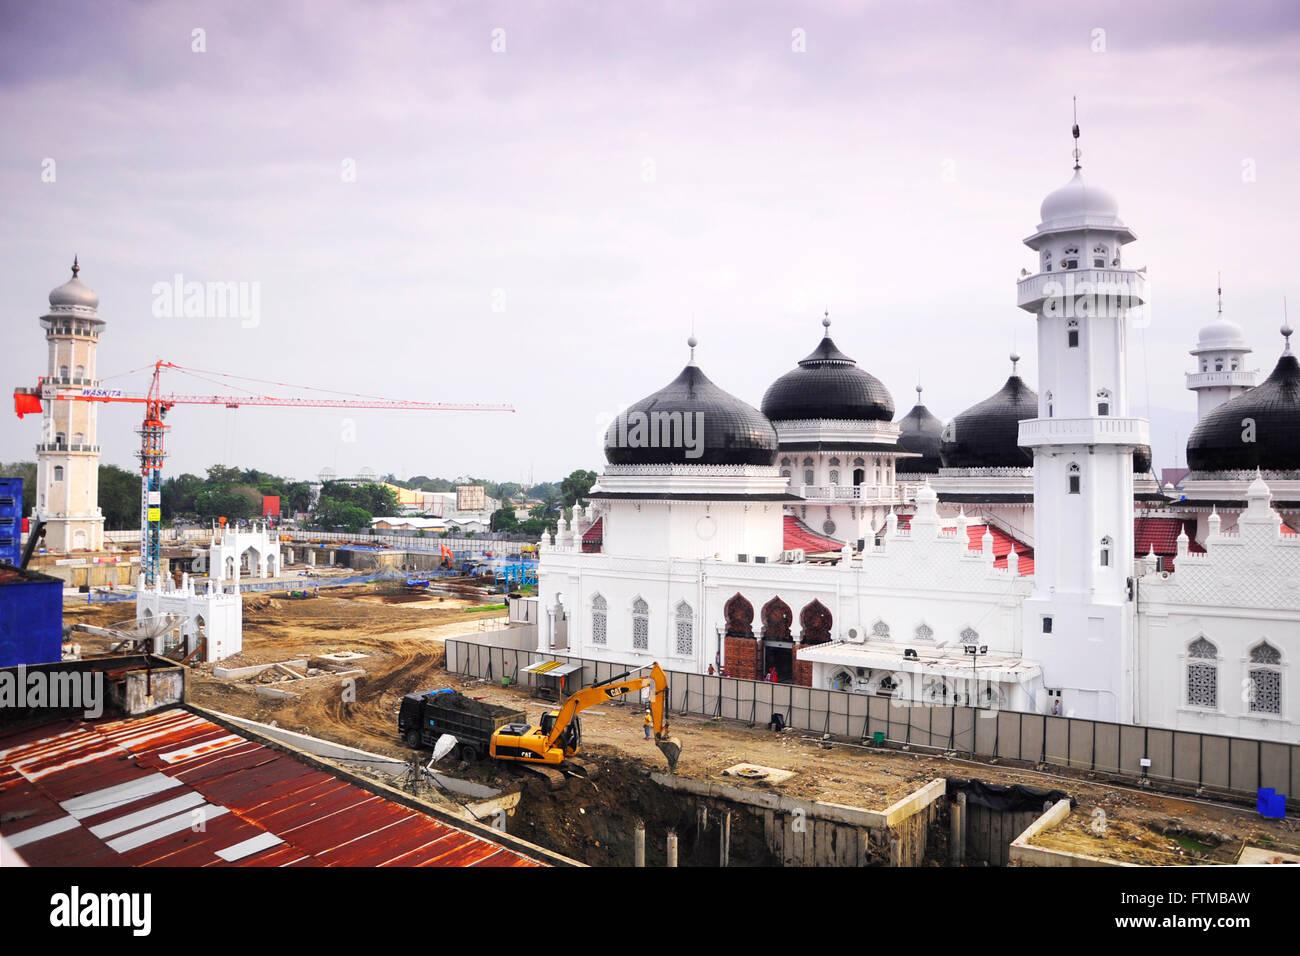 baiturrahman mosque in Banda Aceh-Indonesia Stock Photo